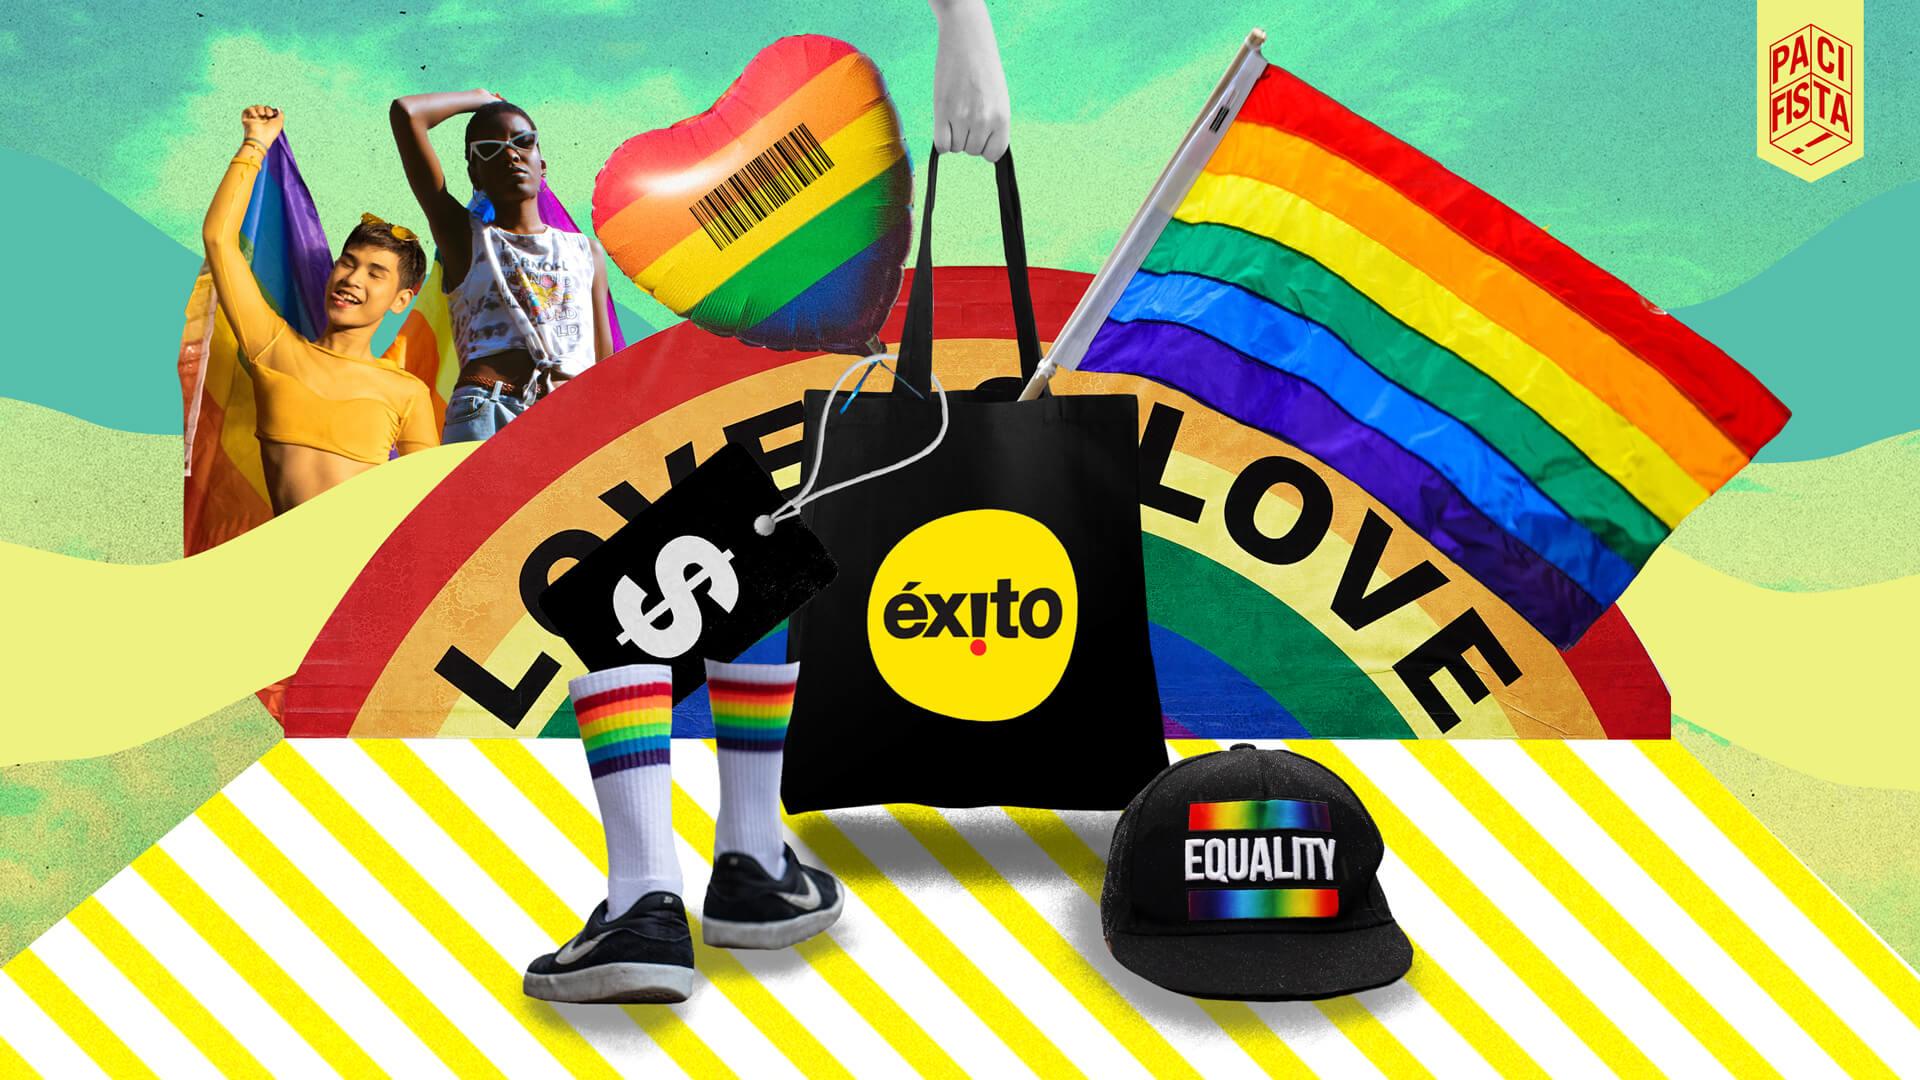 Una orgullosa crítica al gaypitalismo